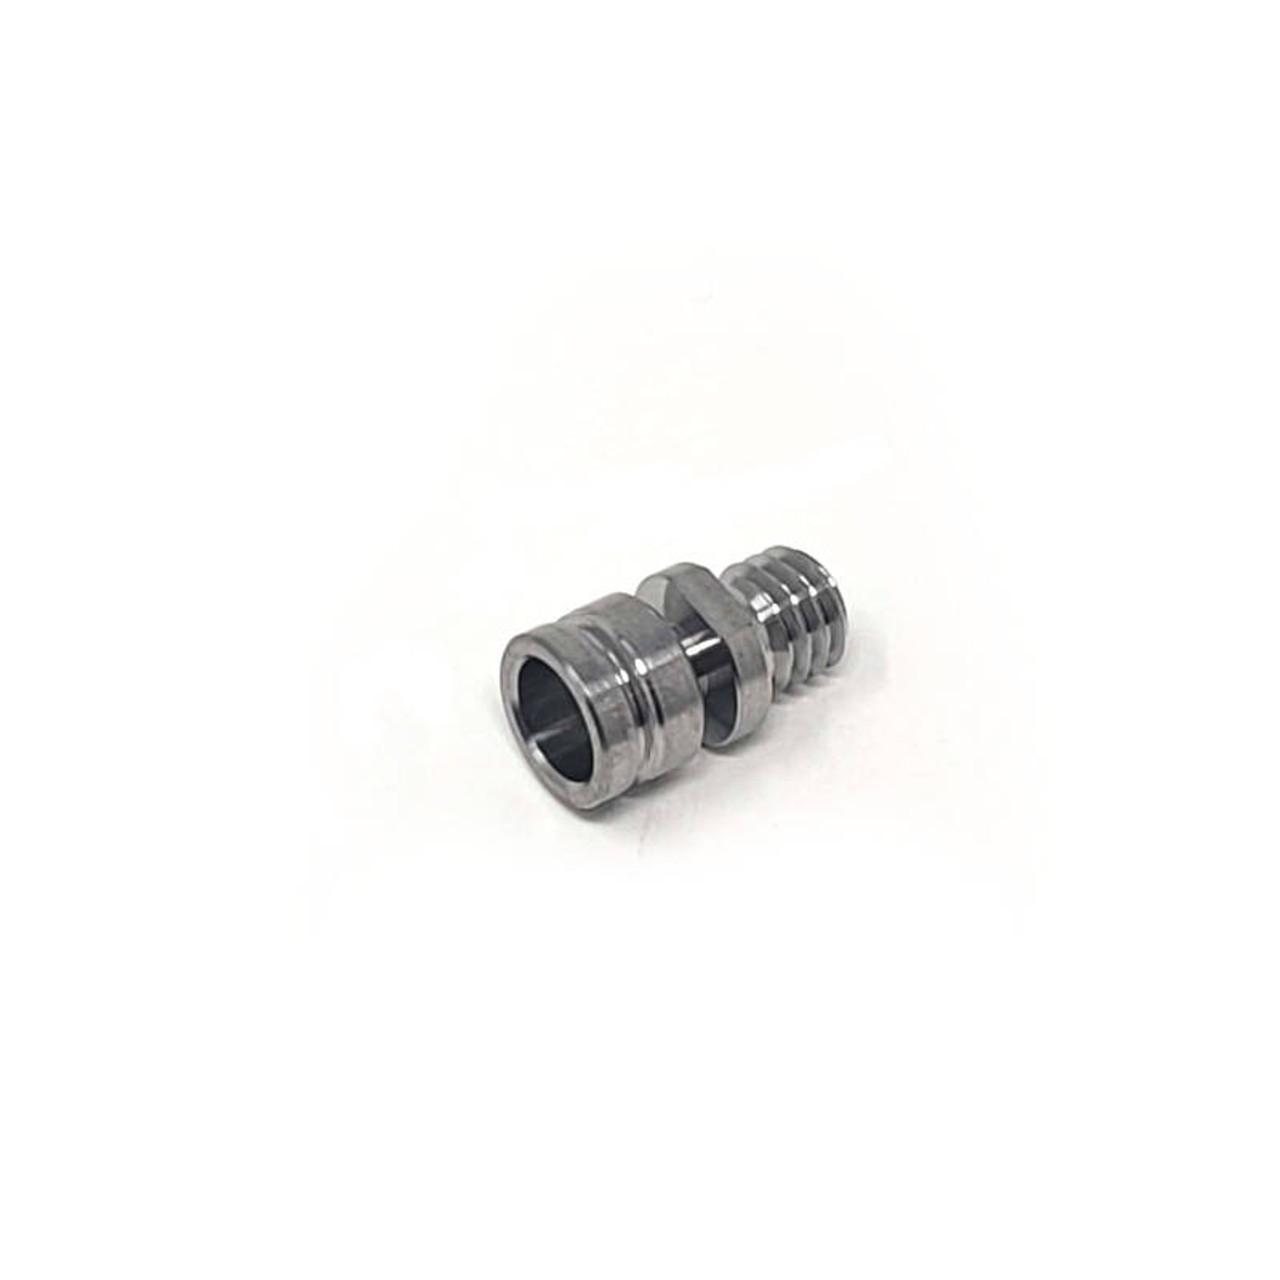 Titanium Thermal Break for CR-10/Pro All Metal Hotend | Micro Swiss